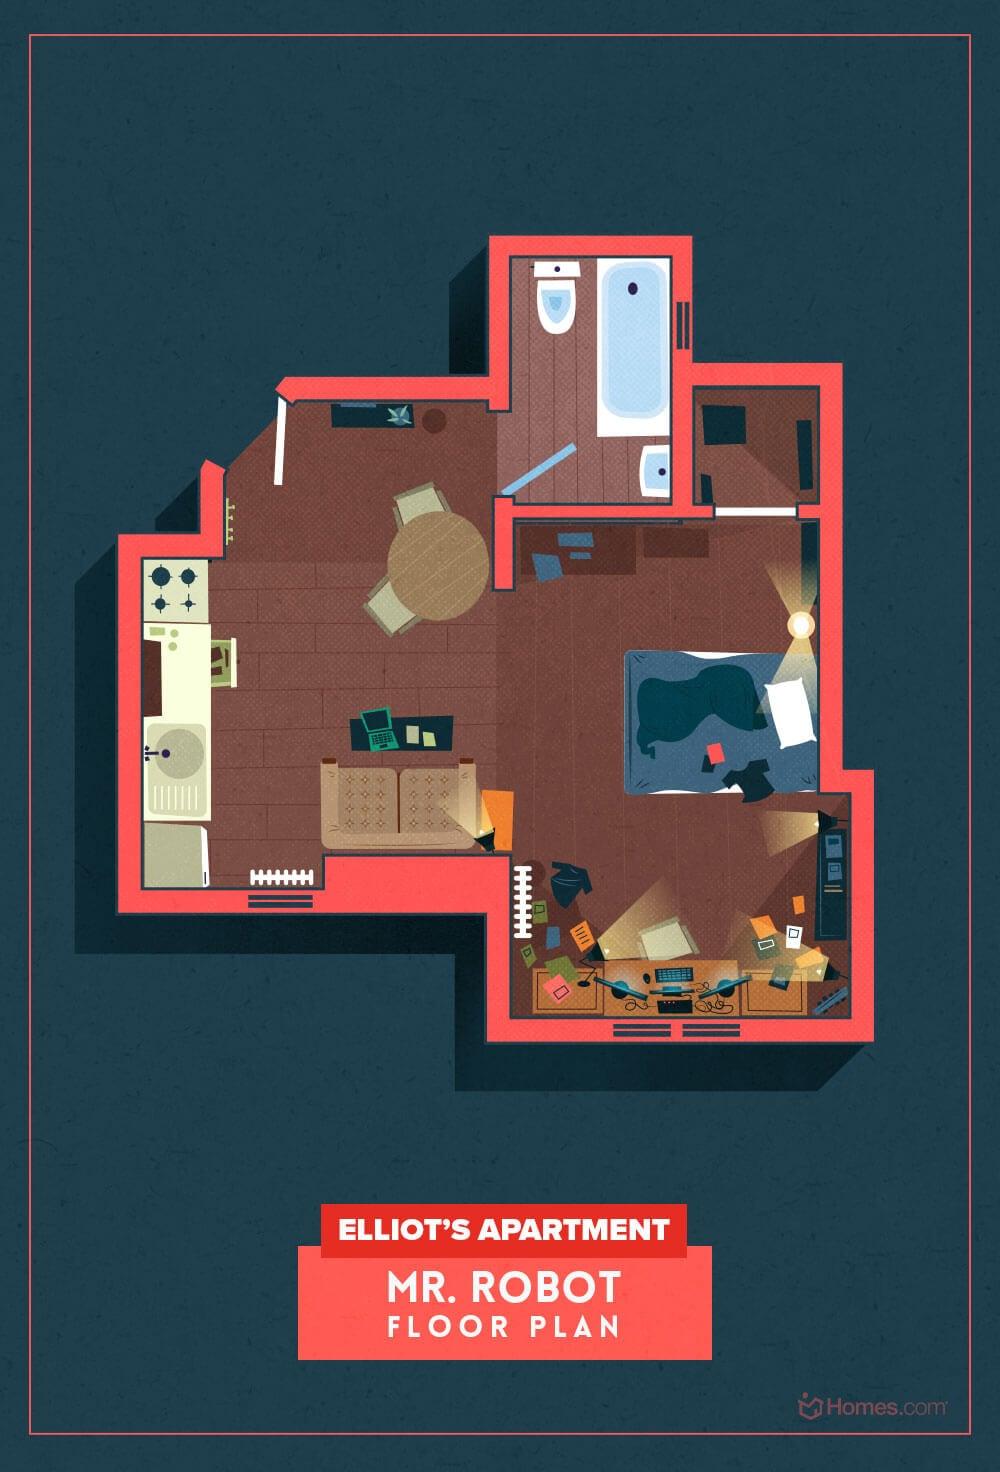 home-floor-plans-illustrations-5